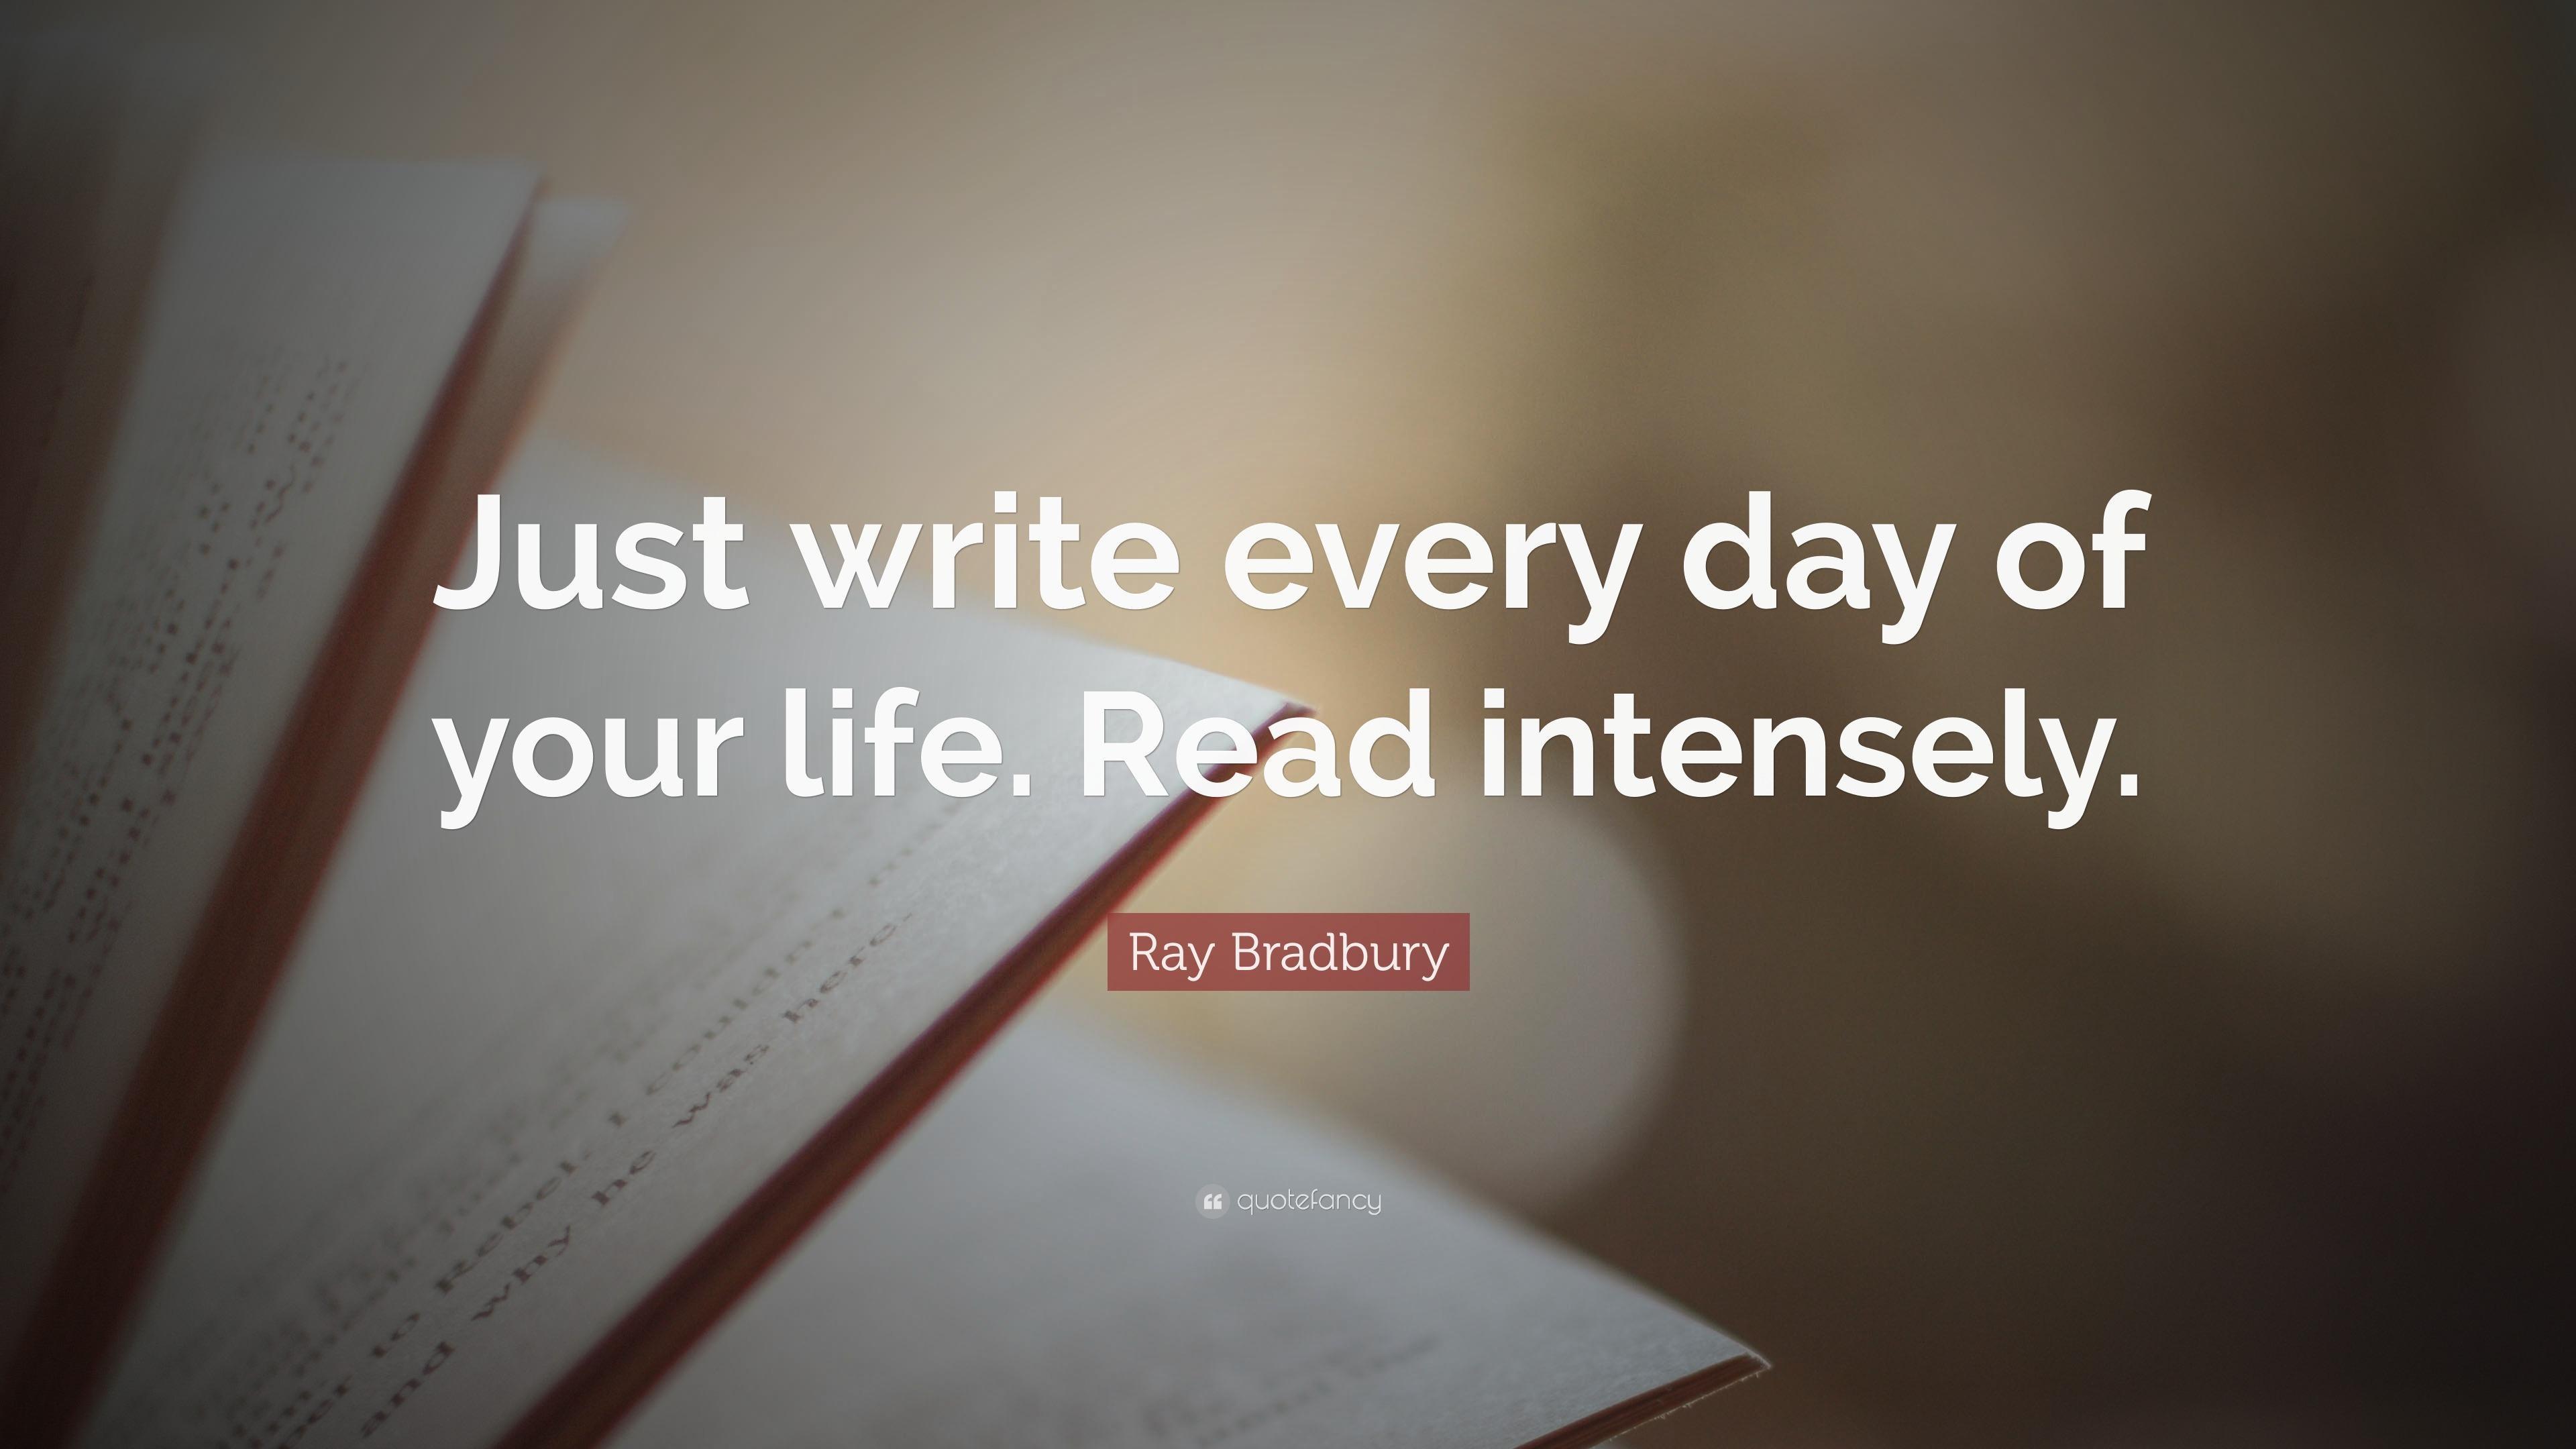 ray bradbury says read!!! Personal background american novelist, short-story writer, essayist, playwright, screenwriter, and poet — ray bradbury was born in waukegan, illinois on august 22, 1920, the third son of leonard spaulding bradbury and esther marie moberg bradbury.